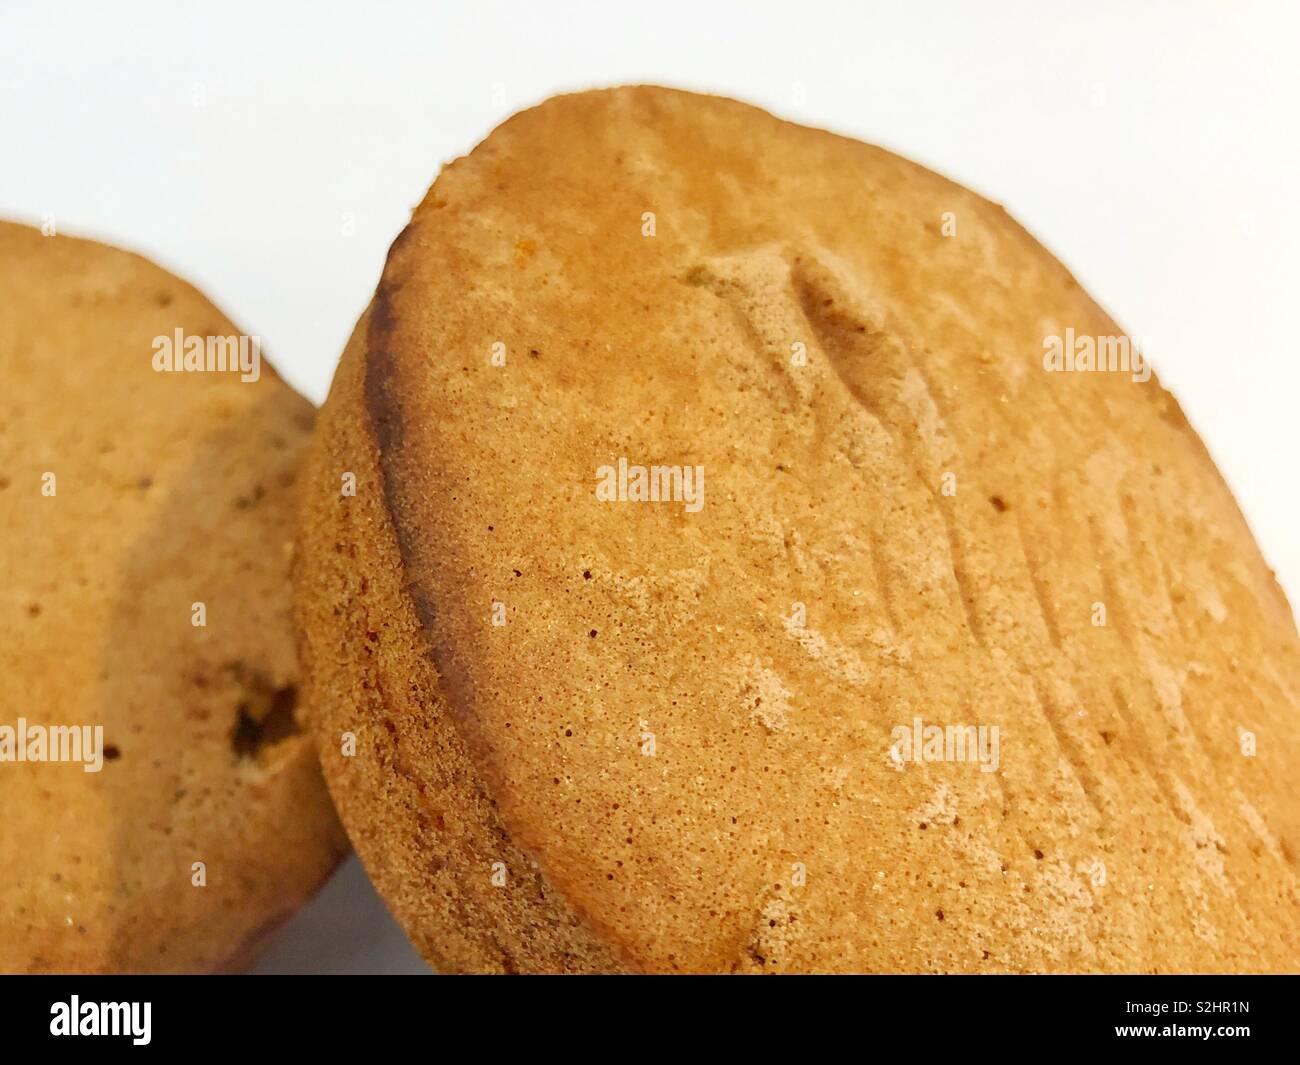 Close up mocha mamon - Stock Image